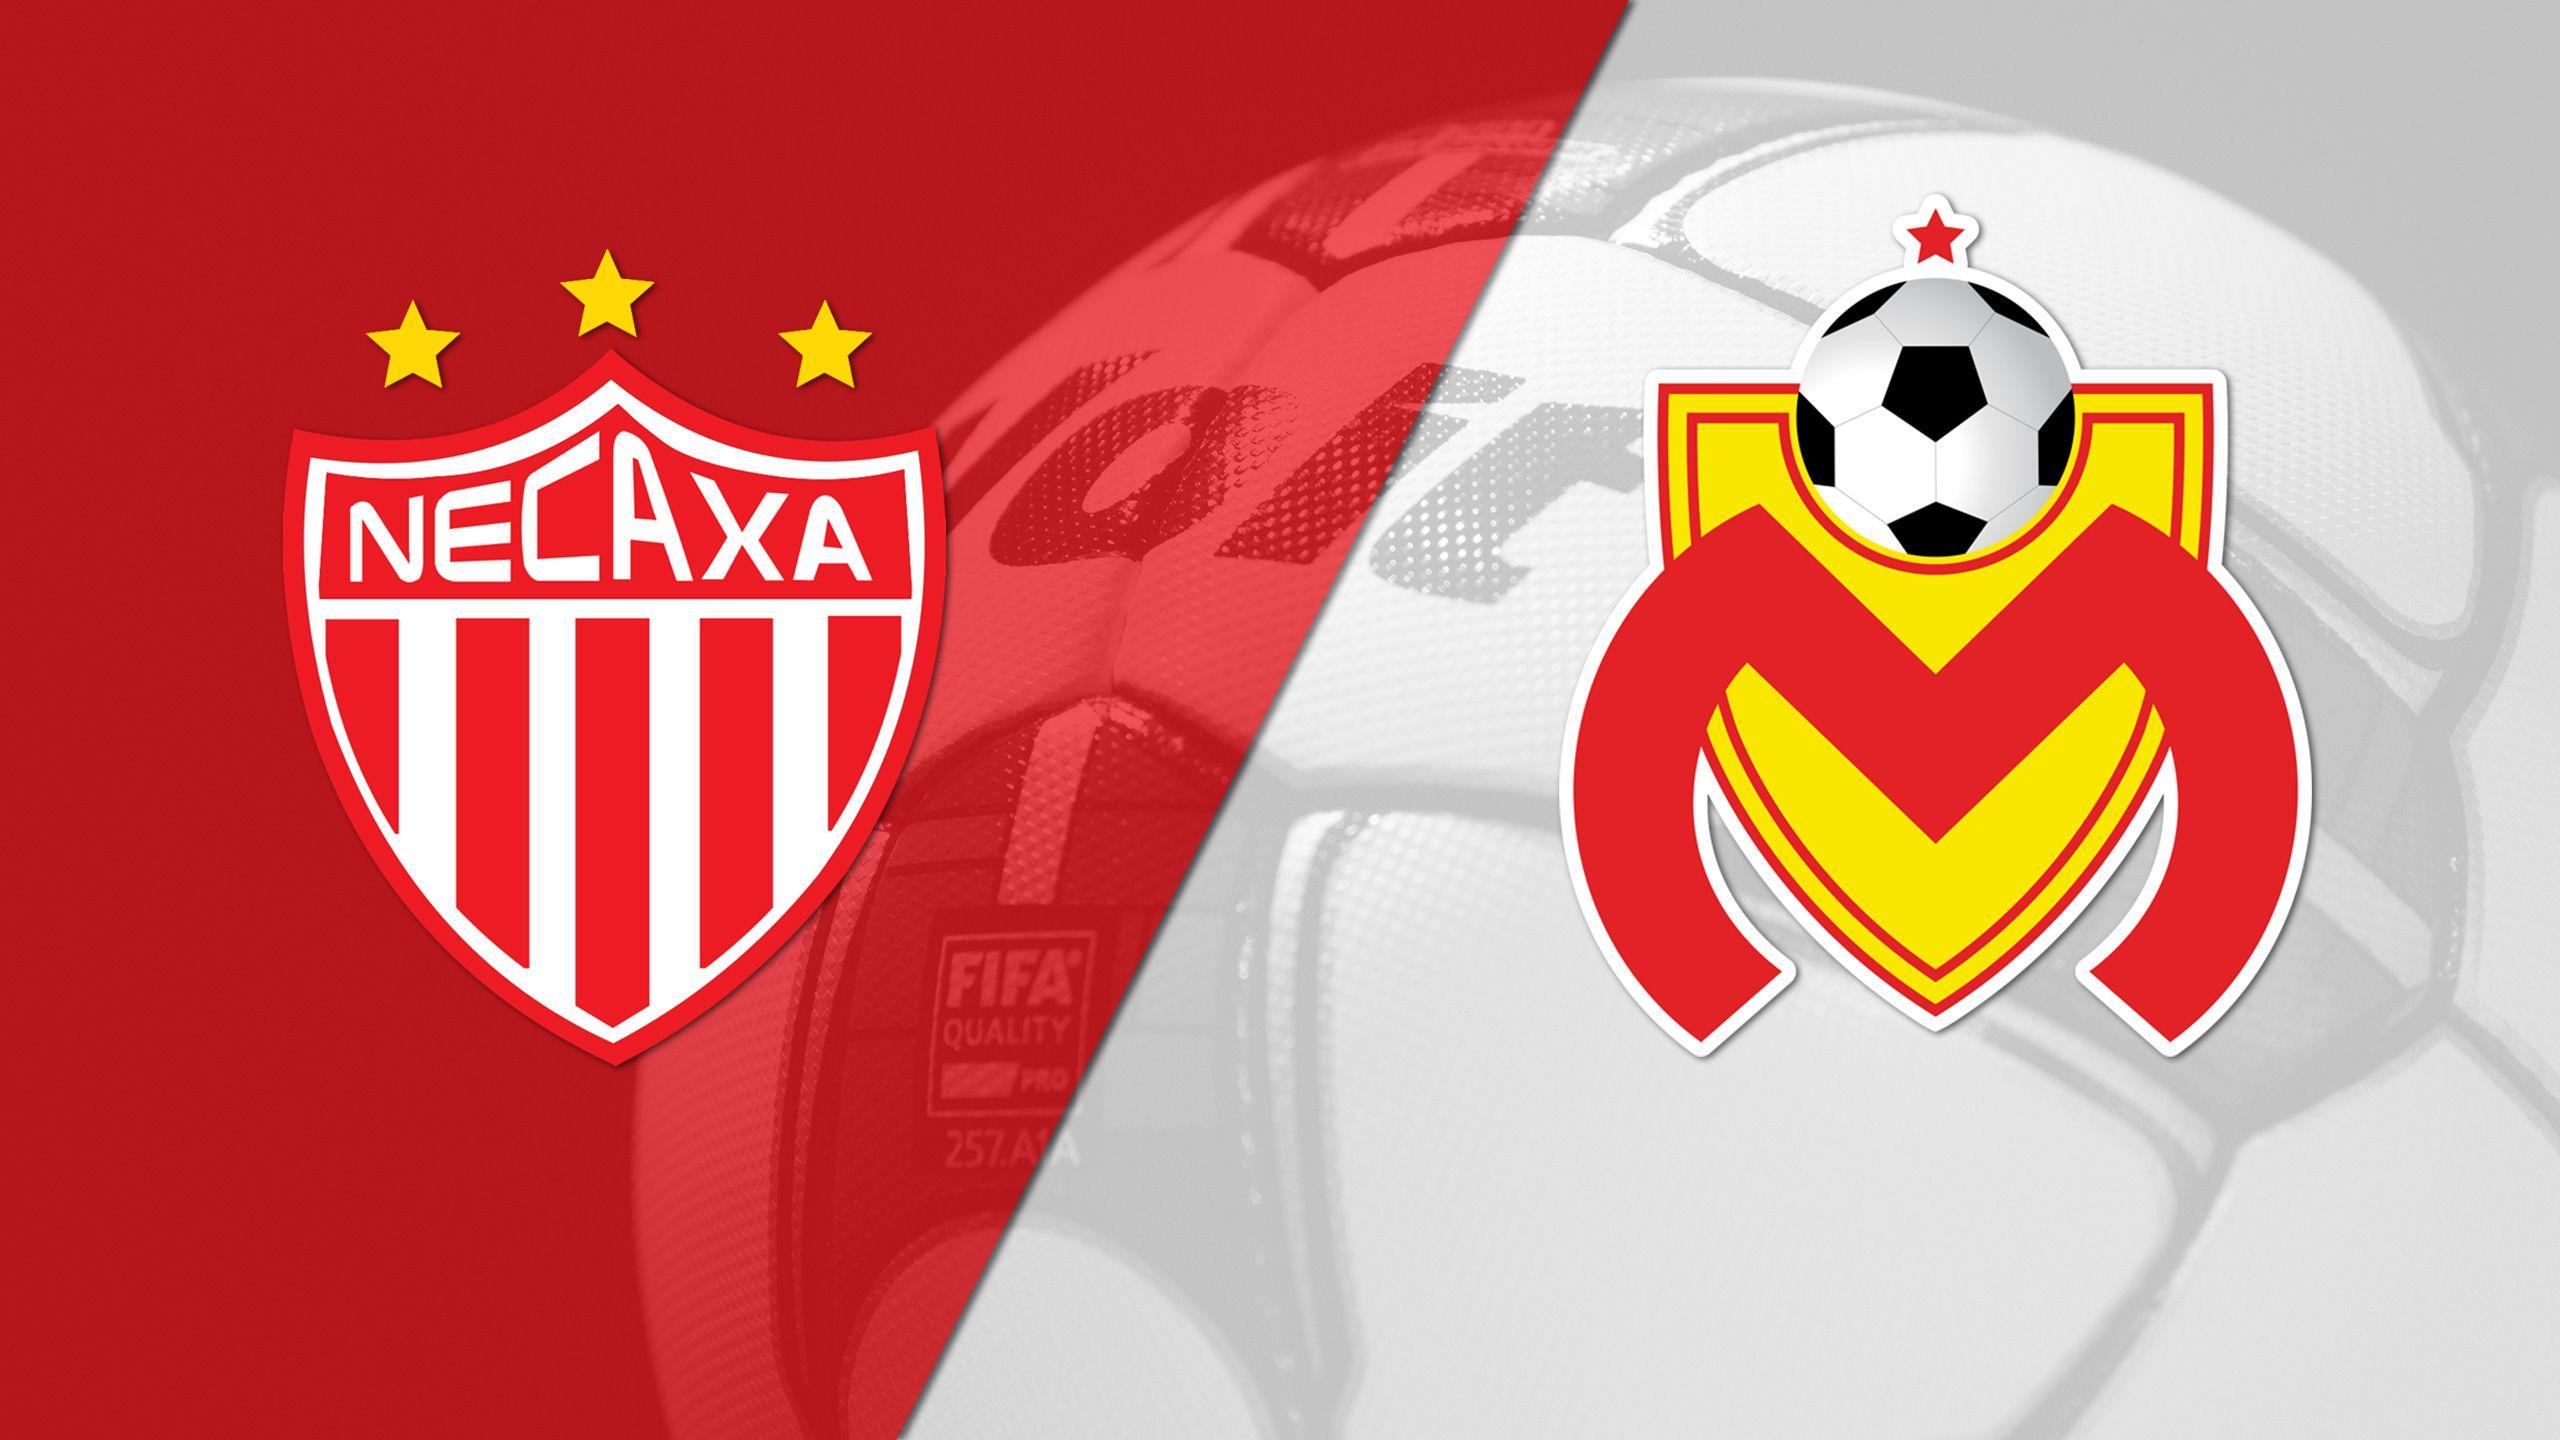 In Spanish - Necaxa vs. Morelia (Matchday #17) (Liga MX)